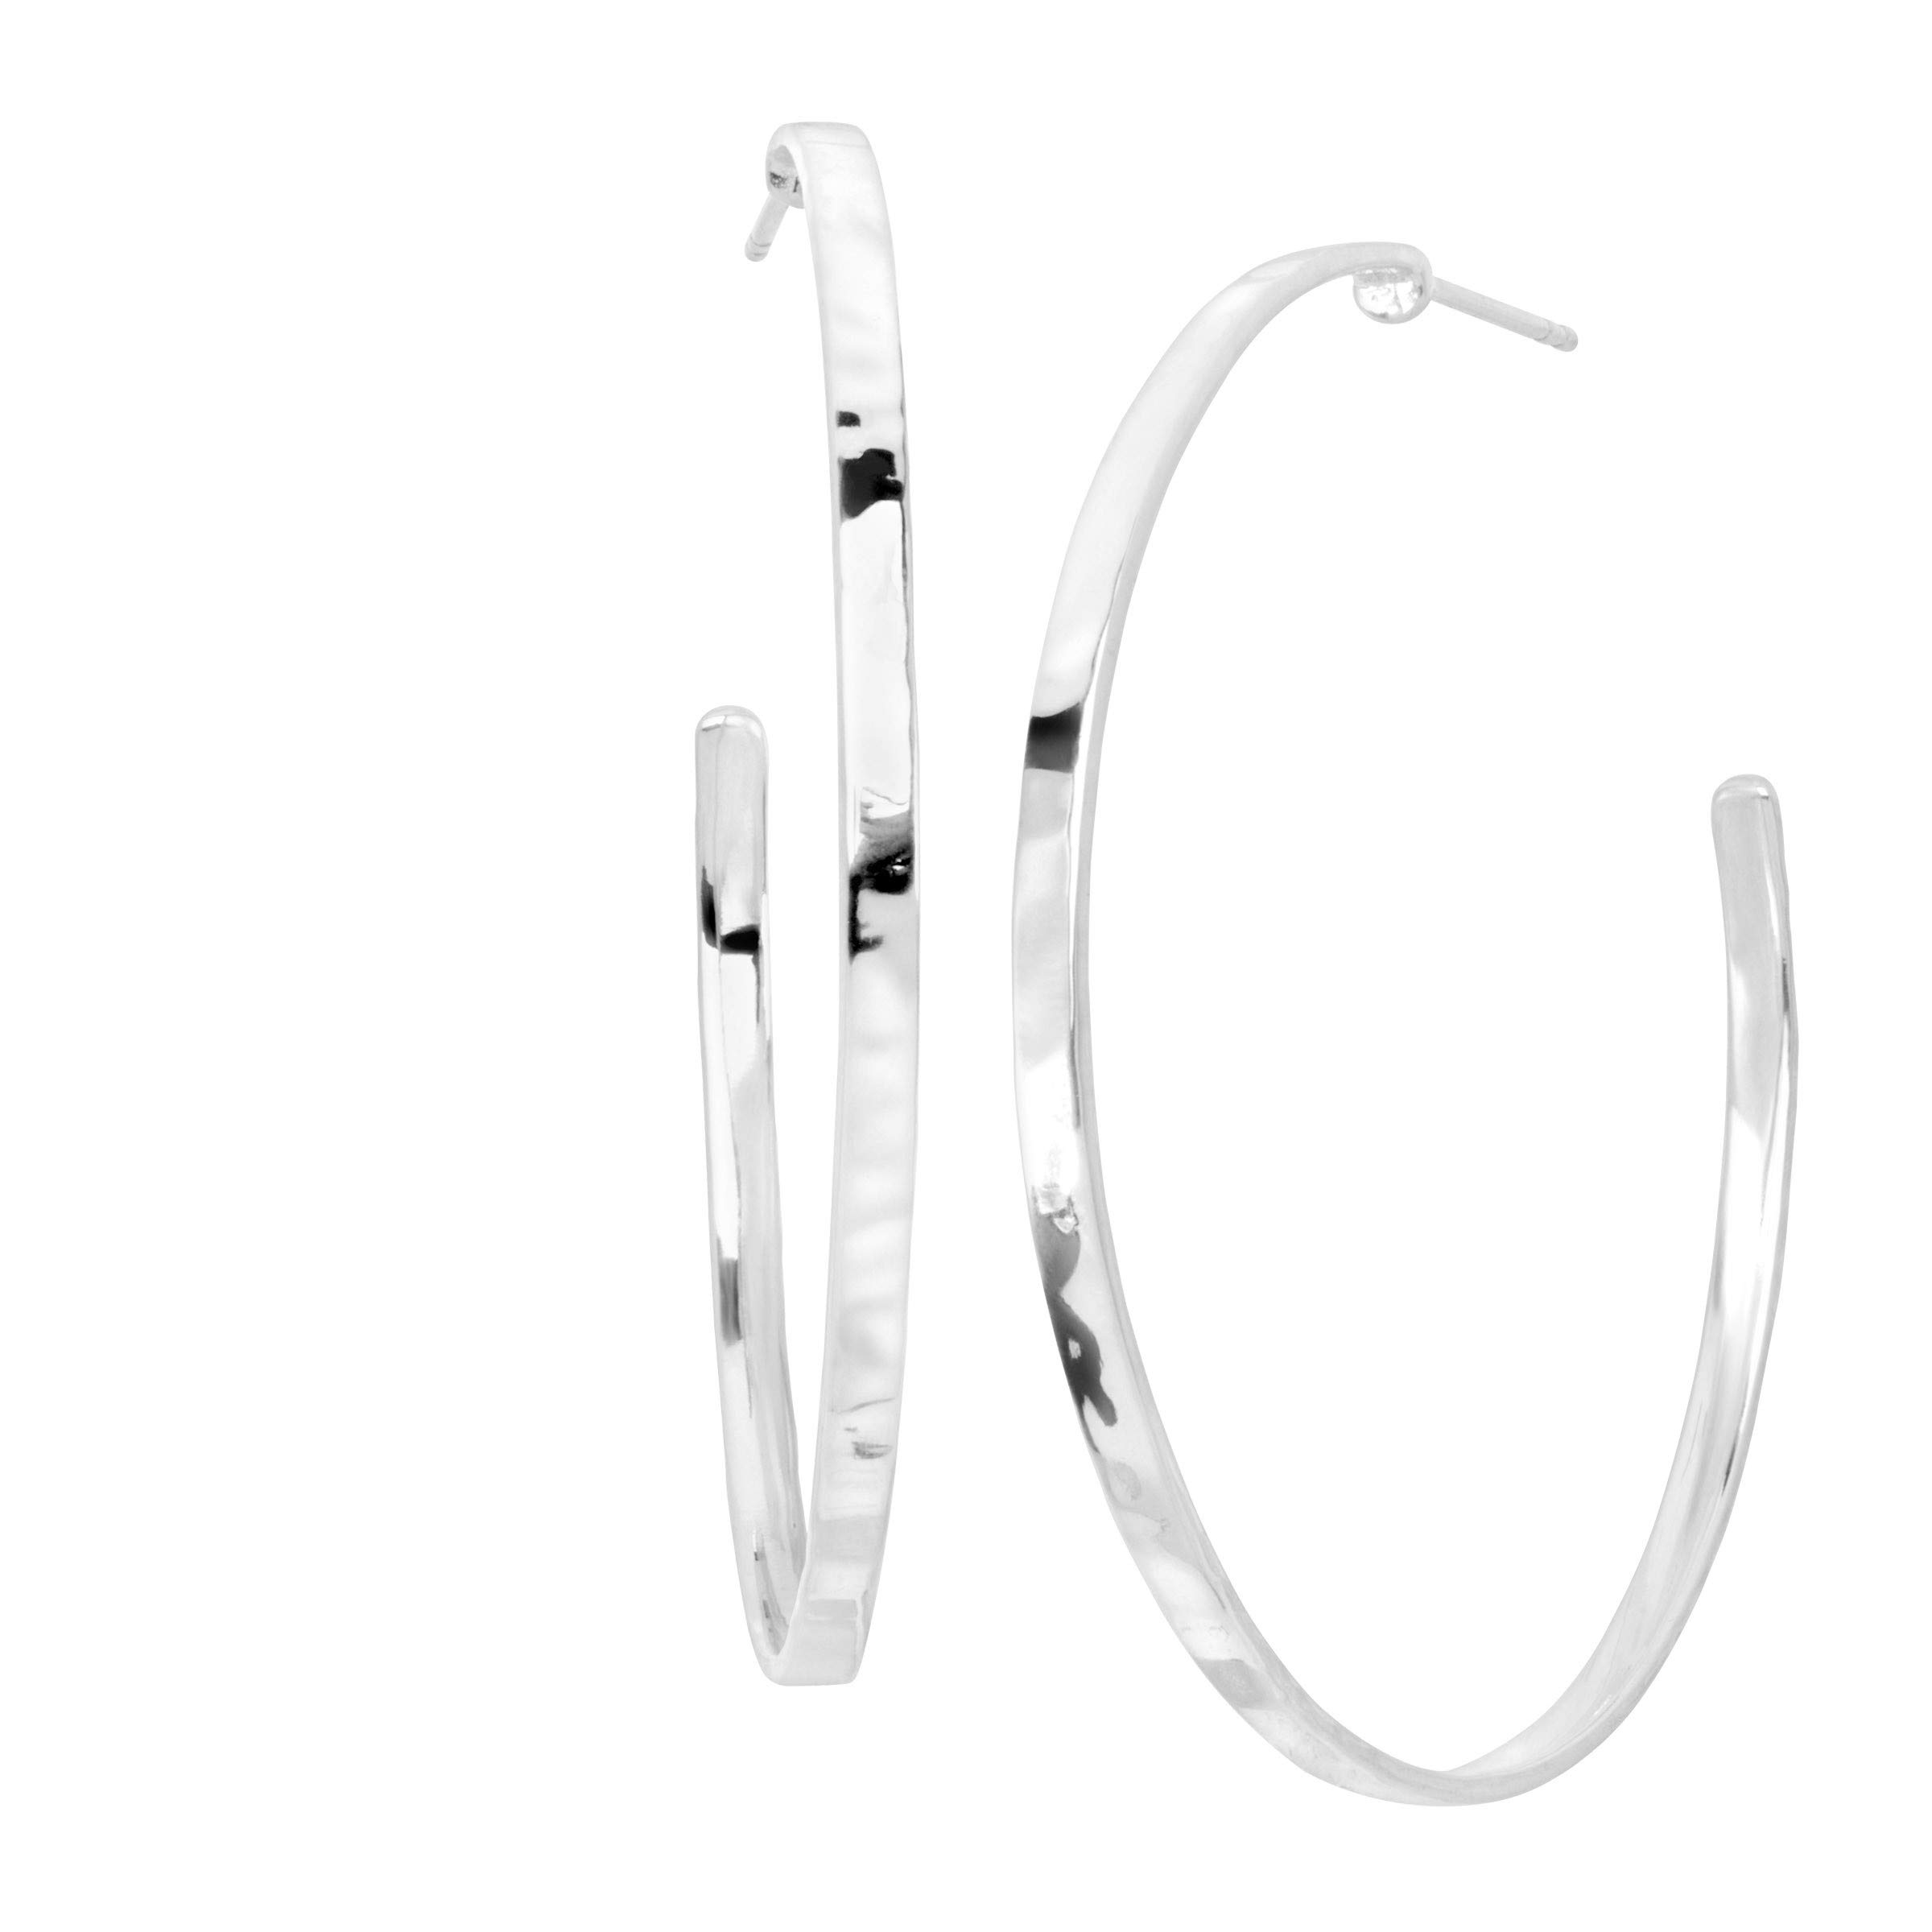 Silpada 'Circle Up' Hammered Hoop Earrings in Sterling Silver by Silpada